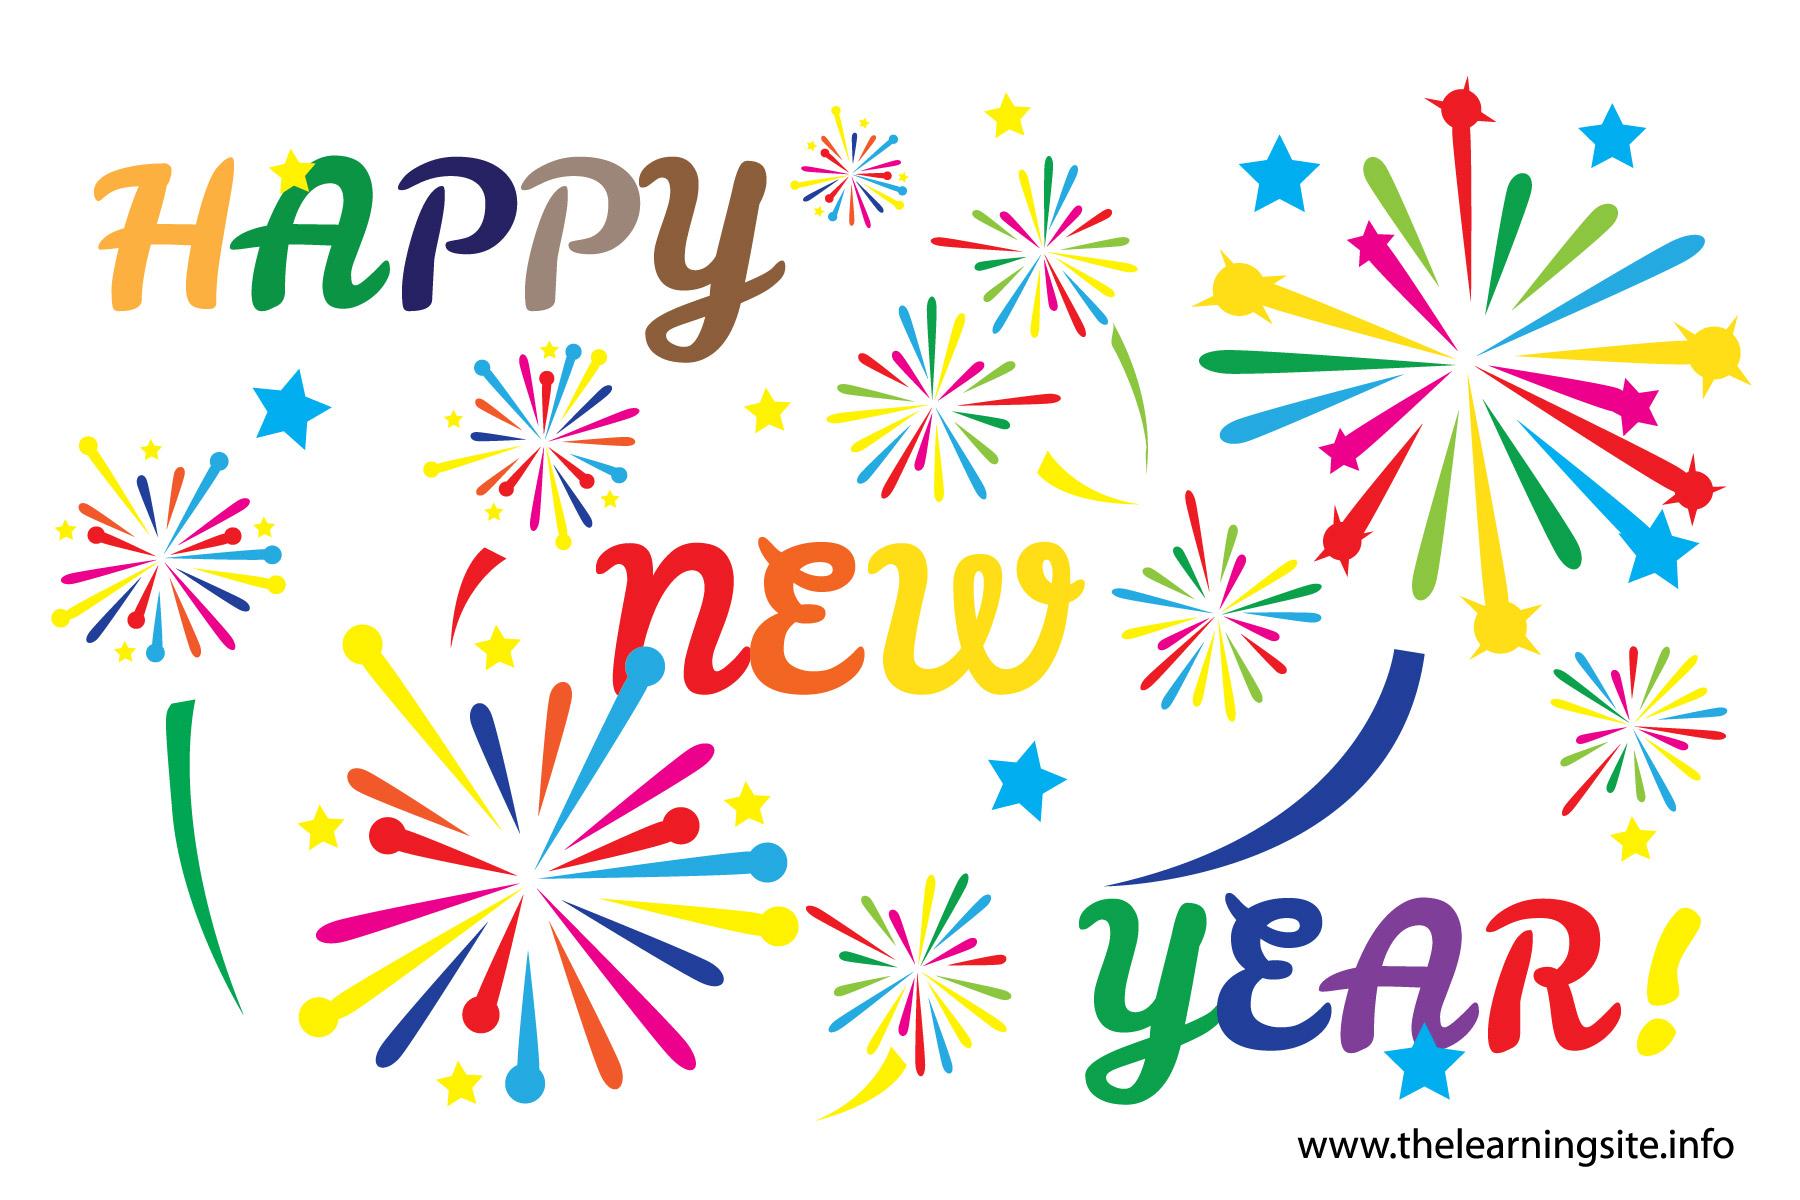 Happy New Year Clipart - .-Happy New Year Clipart - .-1